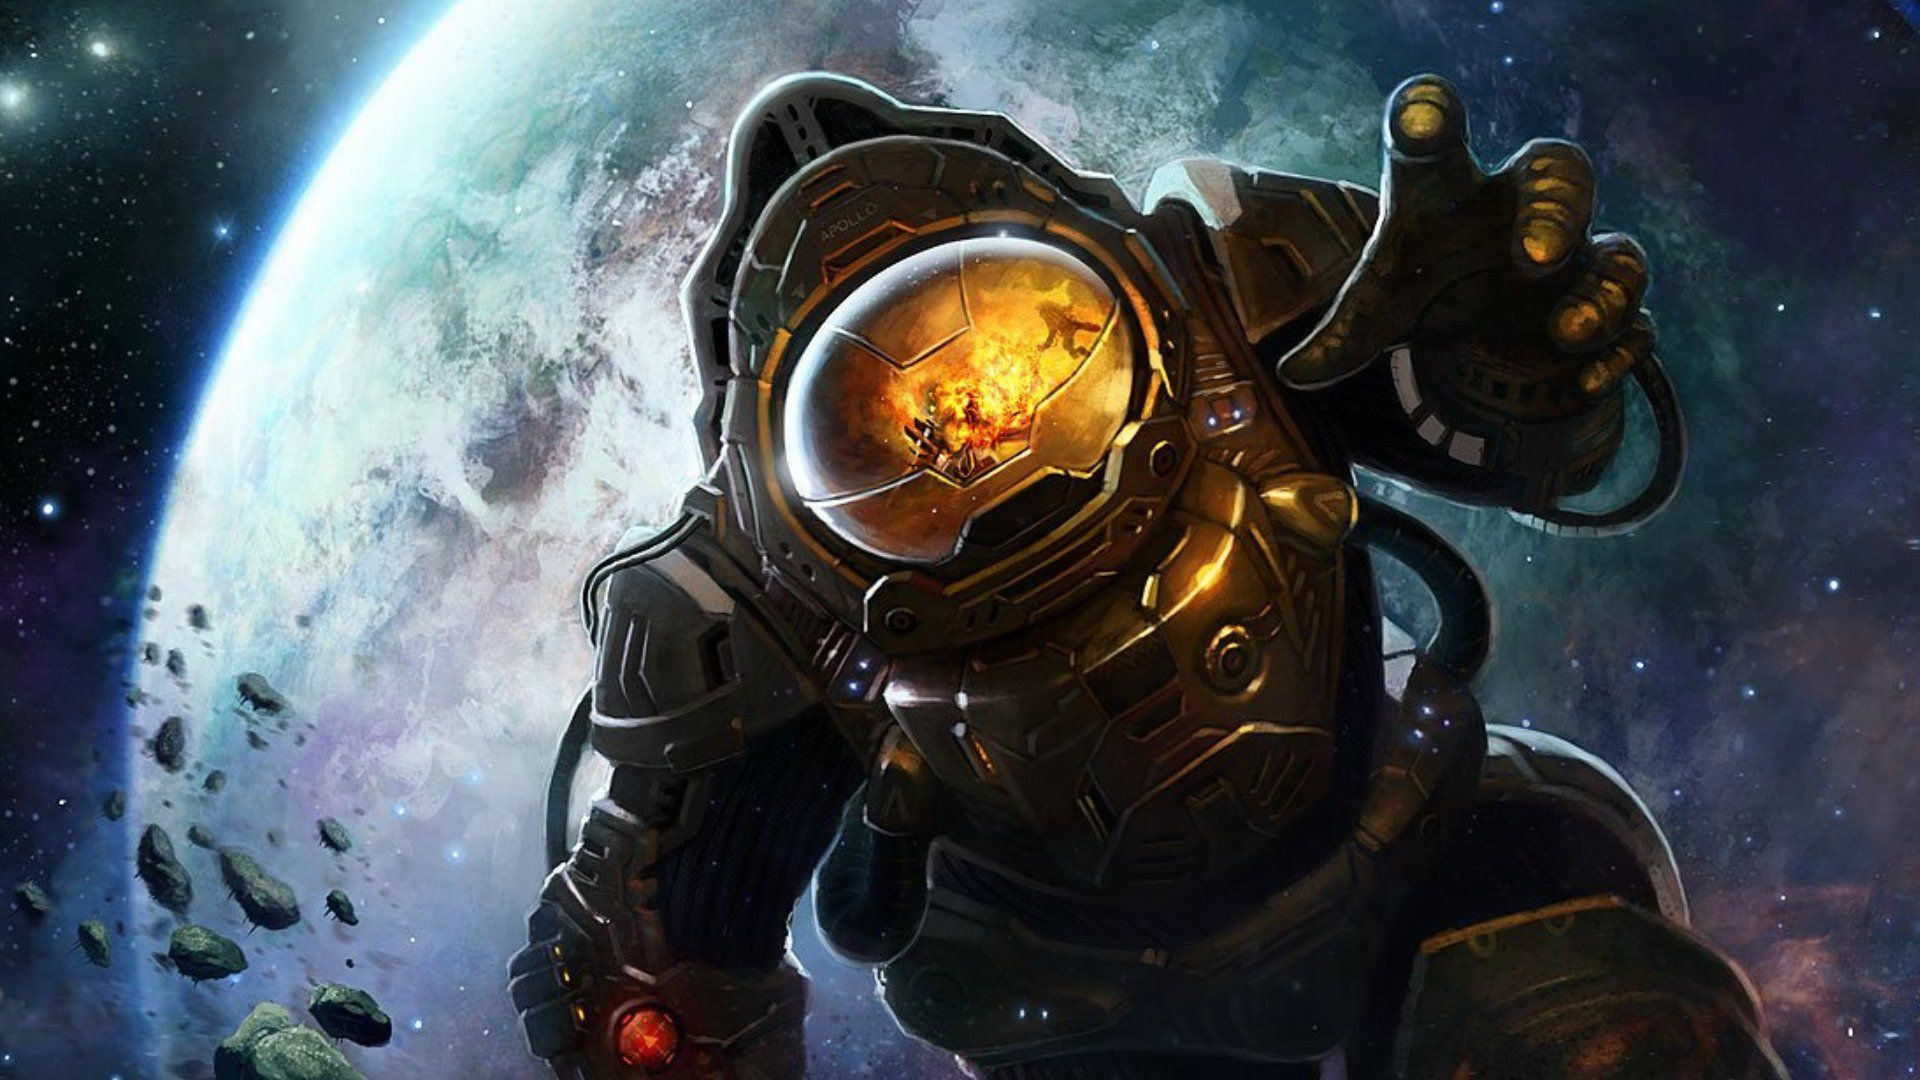 Ciencia Ficción Astronauta Fondo de Pantalla Espacios